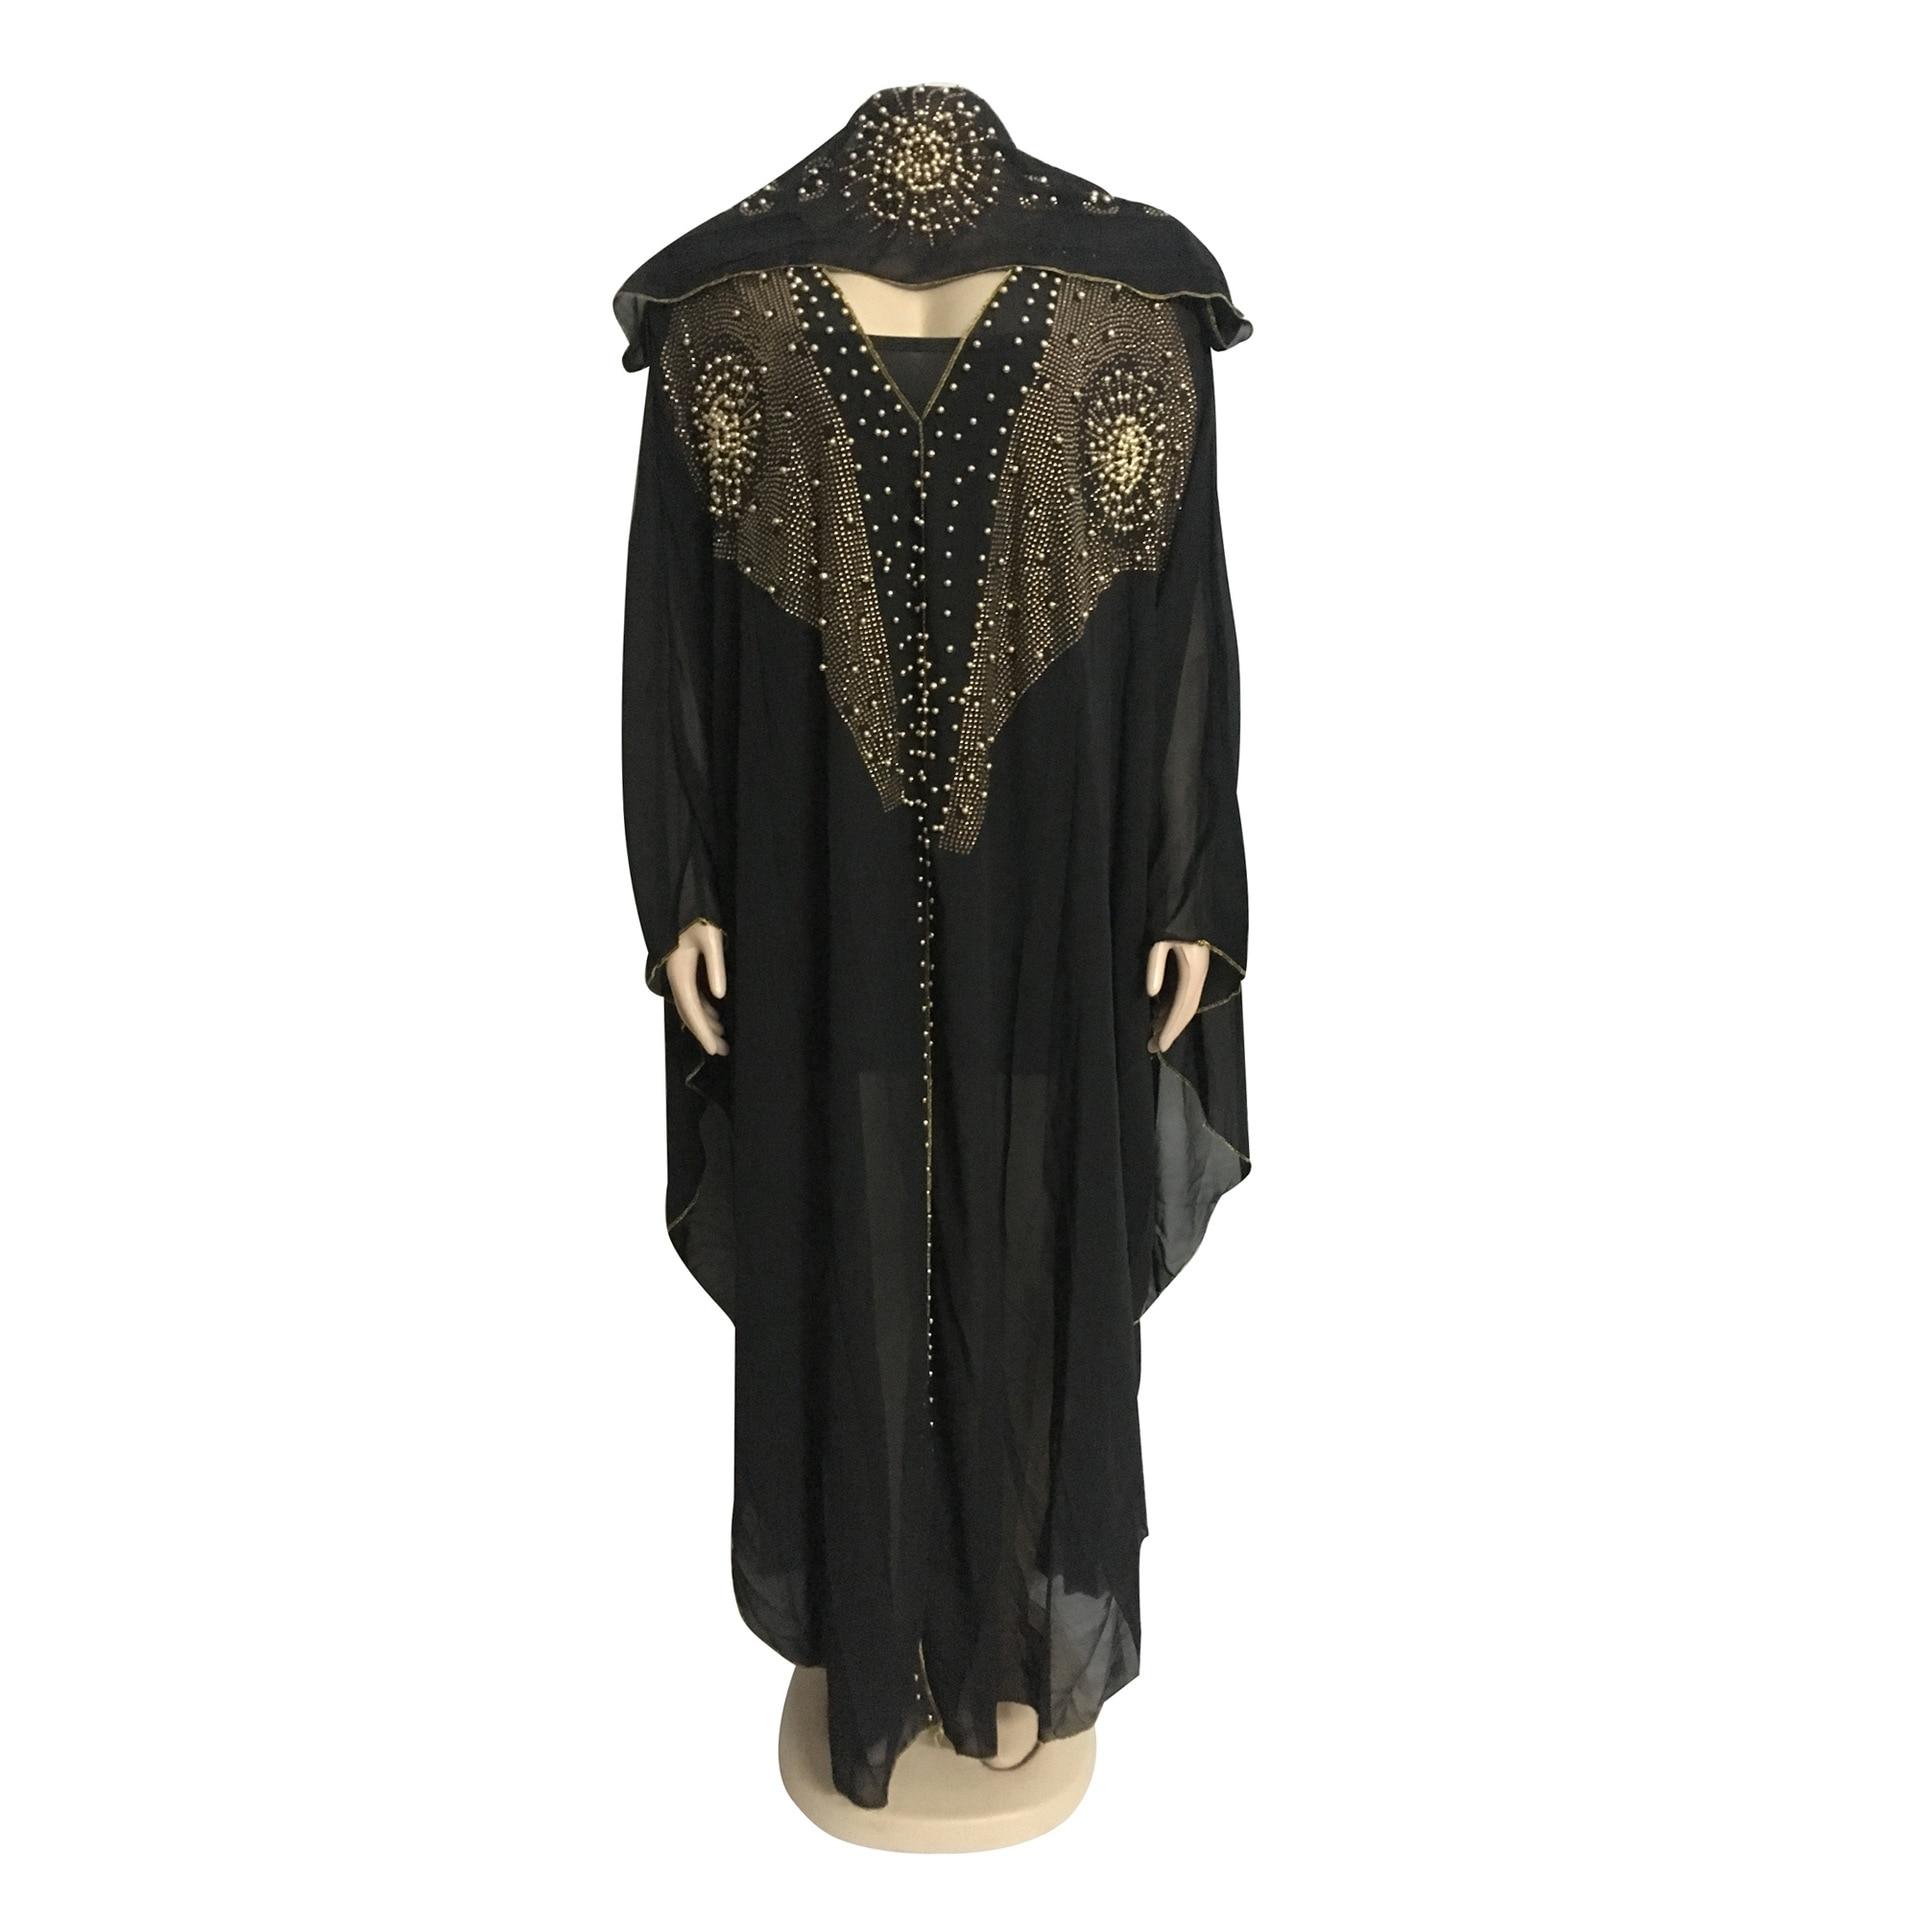 African Dresses For Women Beading Robes Long Maxi Dresses Fashion Plus Size Chiffon Dress Hooded Black Abaya Batwing Vestidos 8